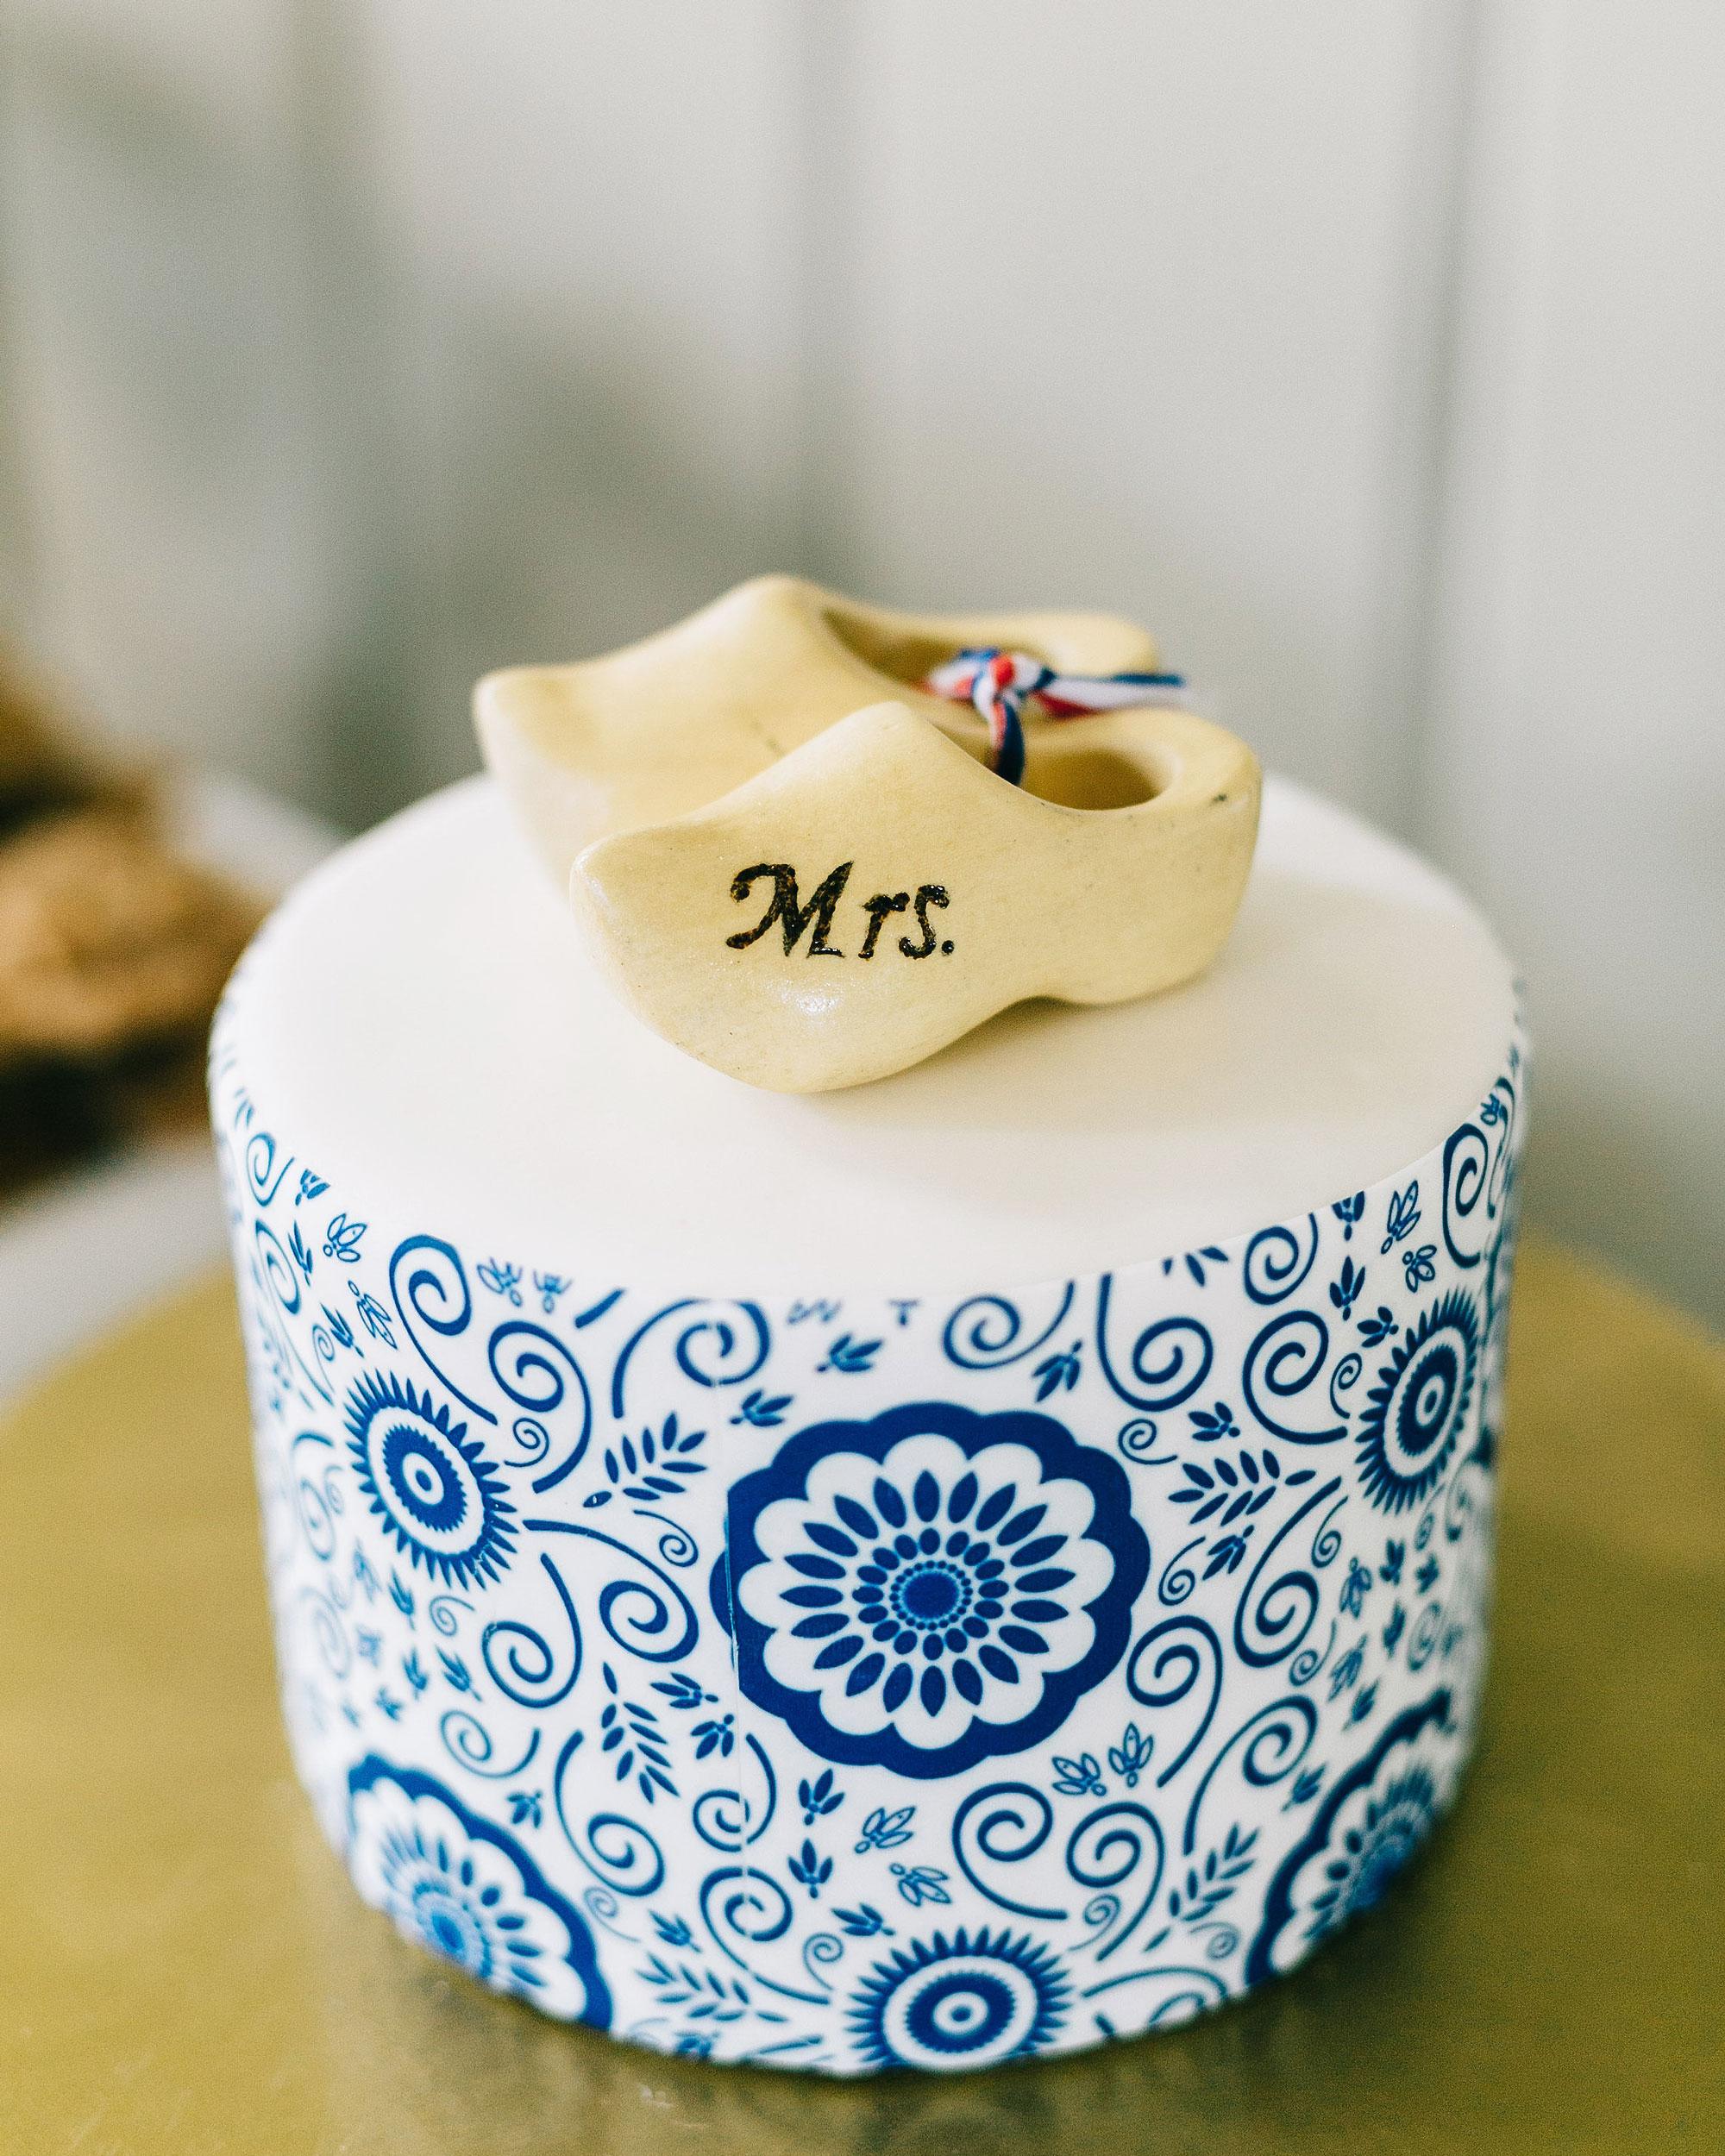 rachel-jurrie-nautical-wedding-cake-0310-s112778-0416.jpg